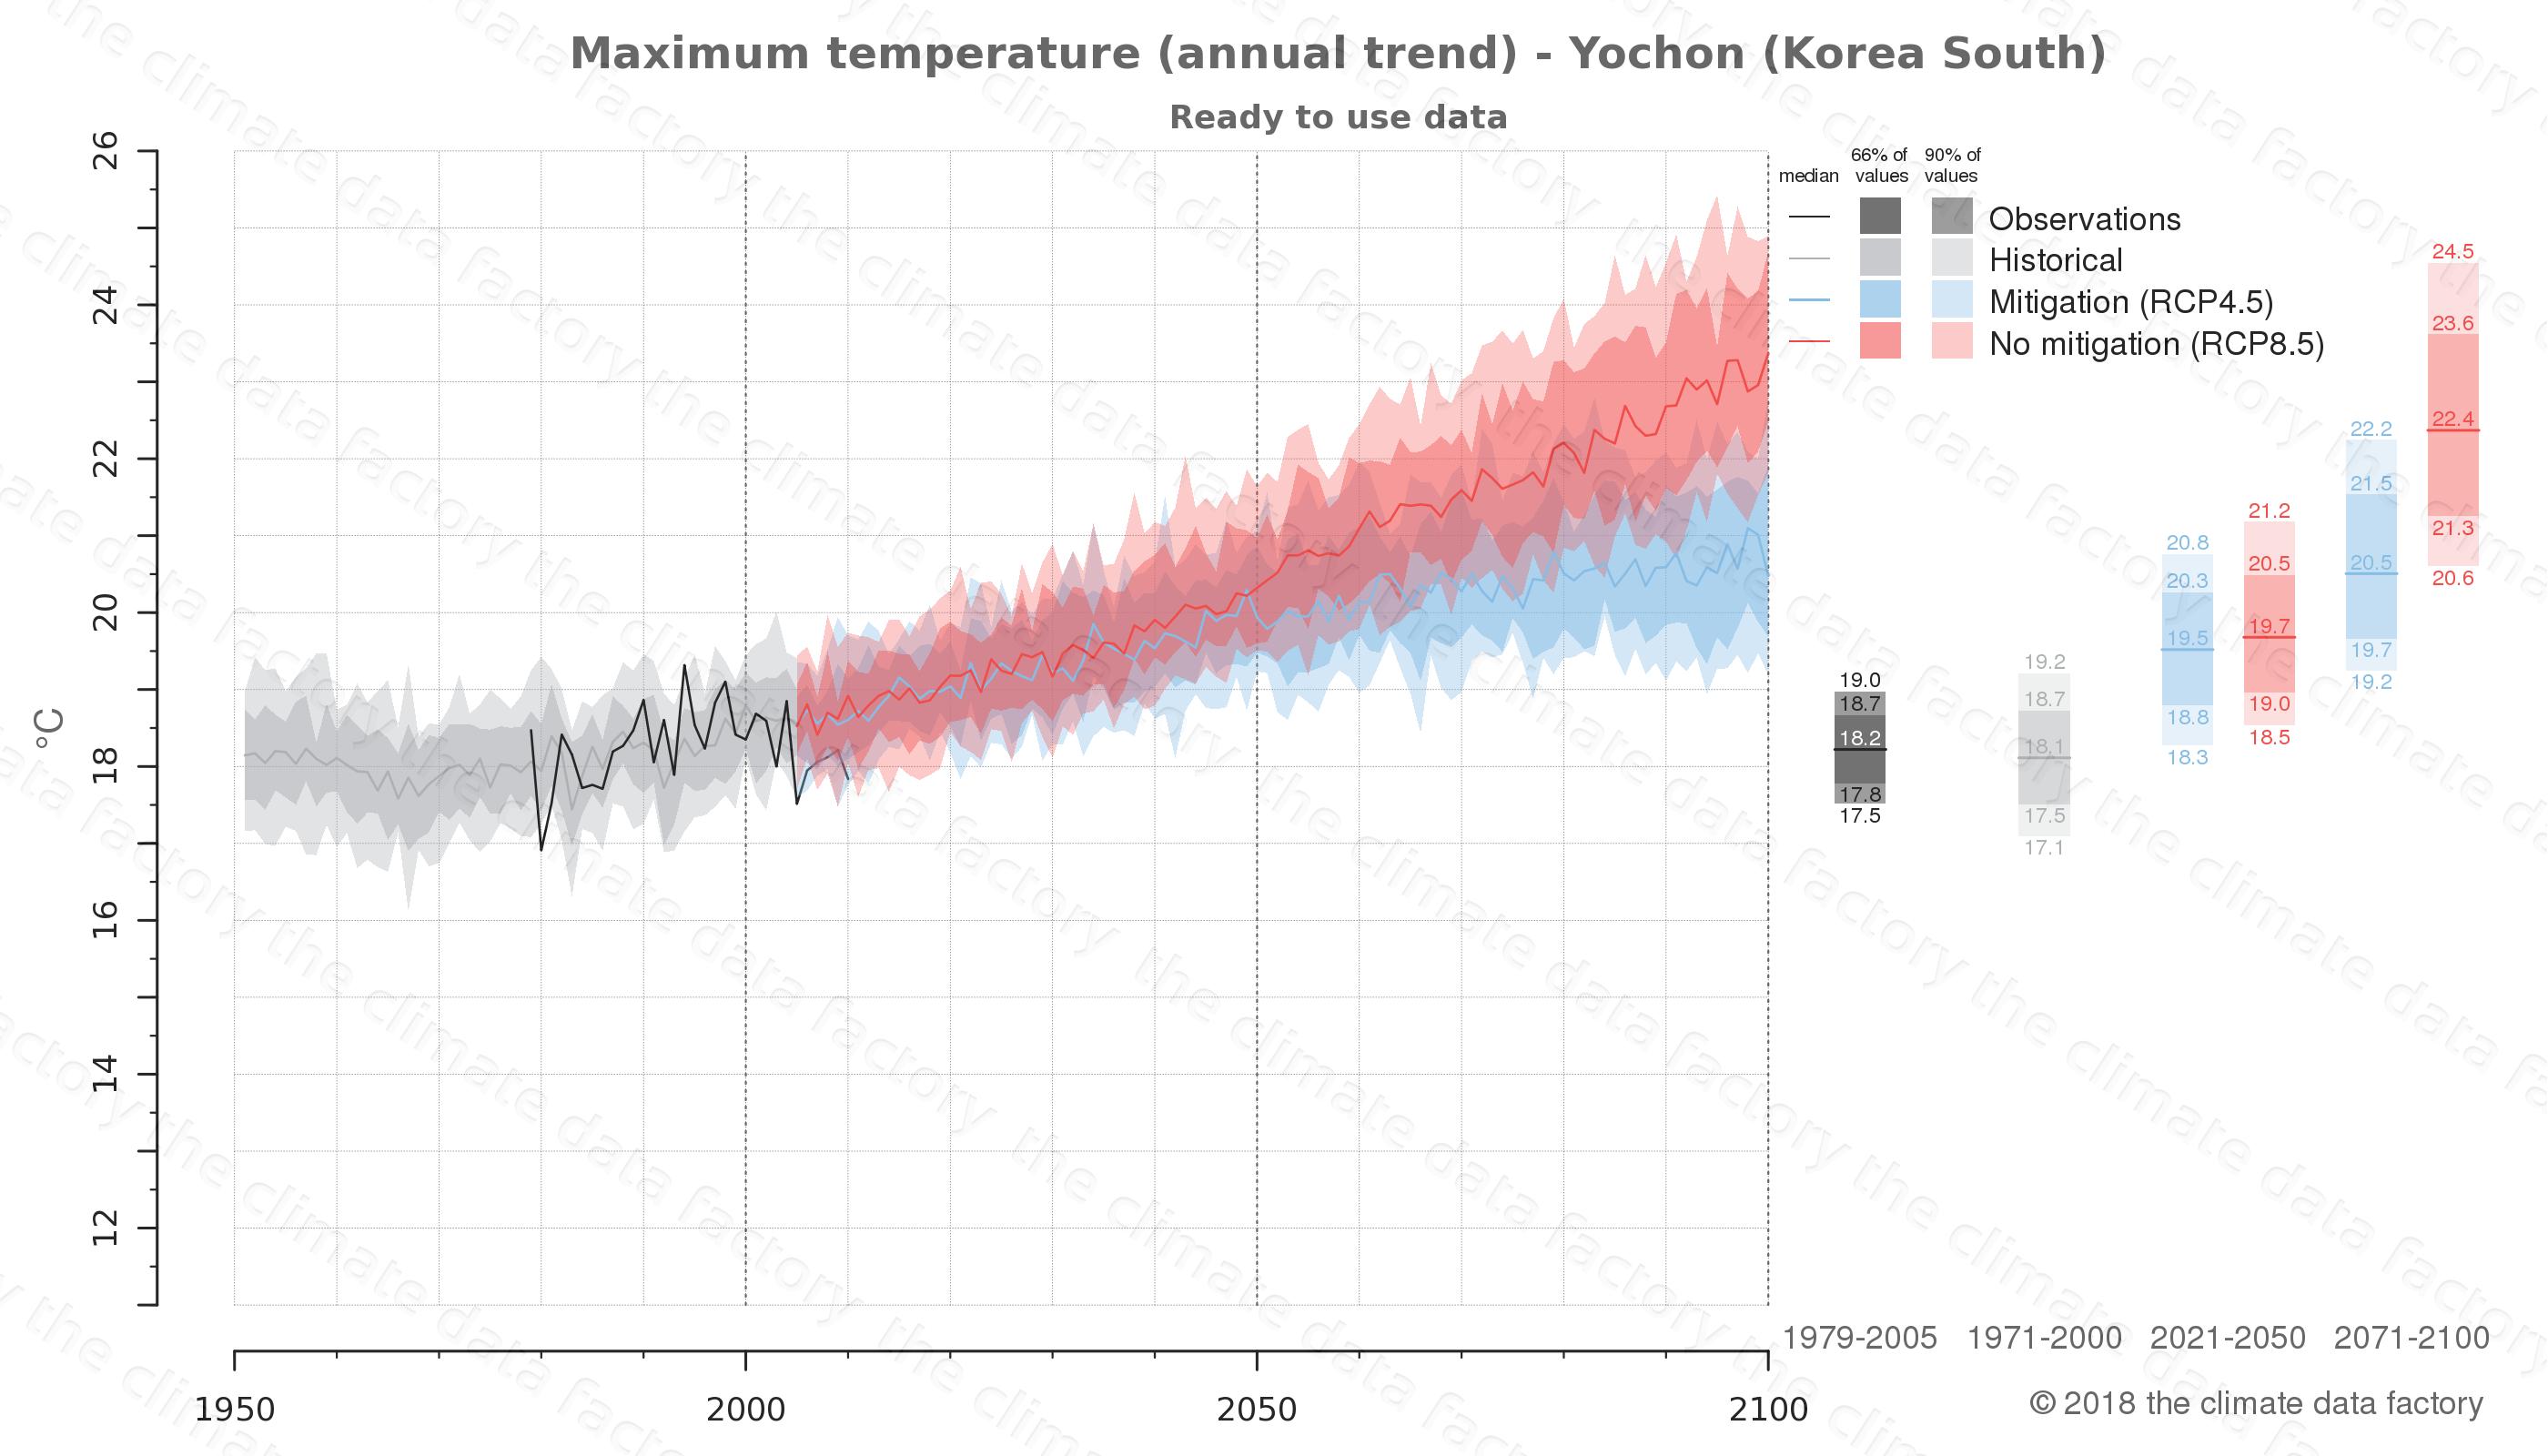 climate change data policy adaptation climate graph city data maximum-temperature yochon south korea